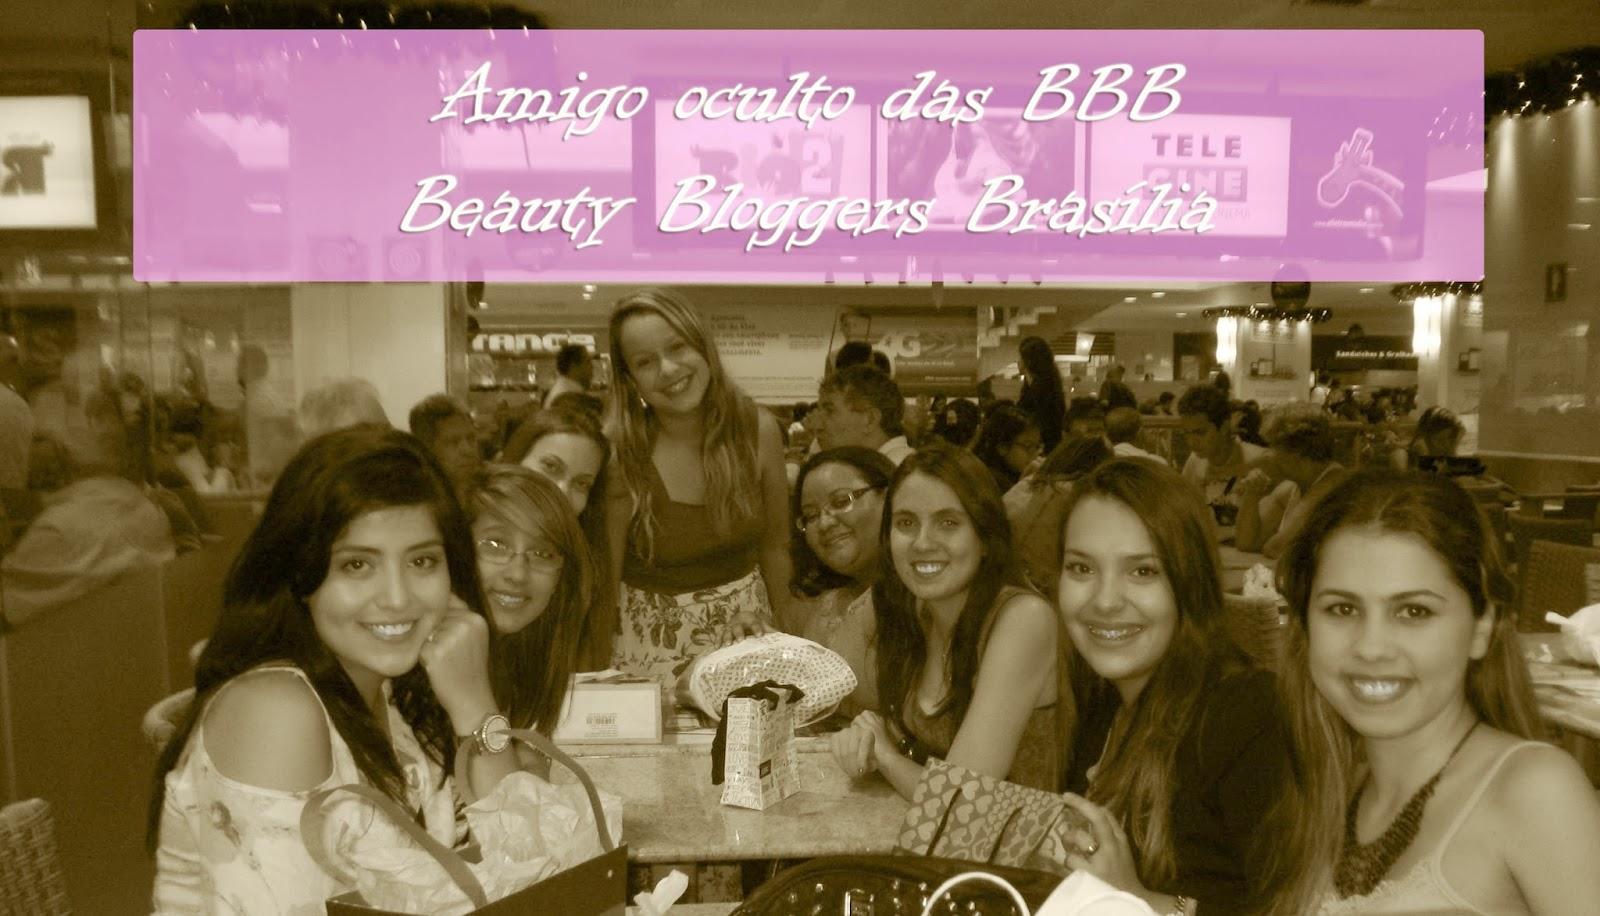 Amigo oculto das BBB - Beauty Bloggers Brasília